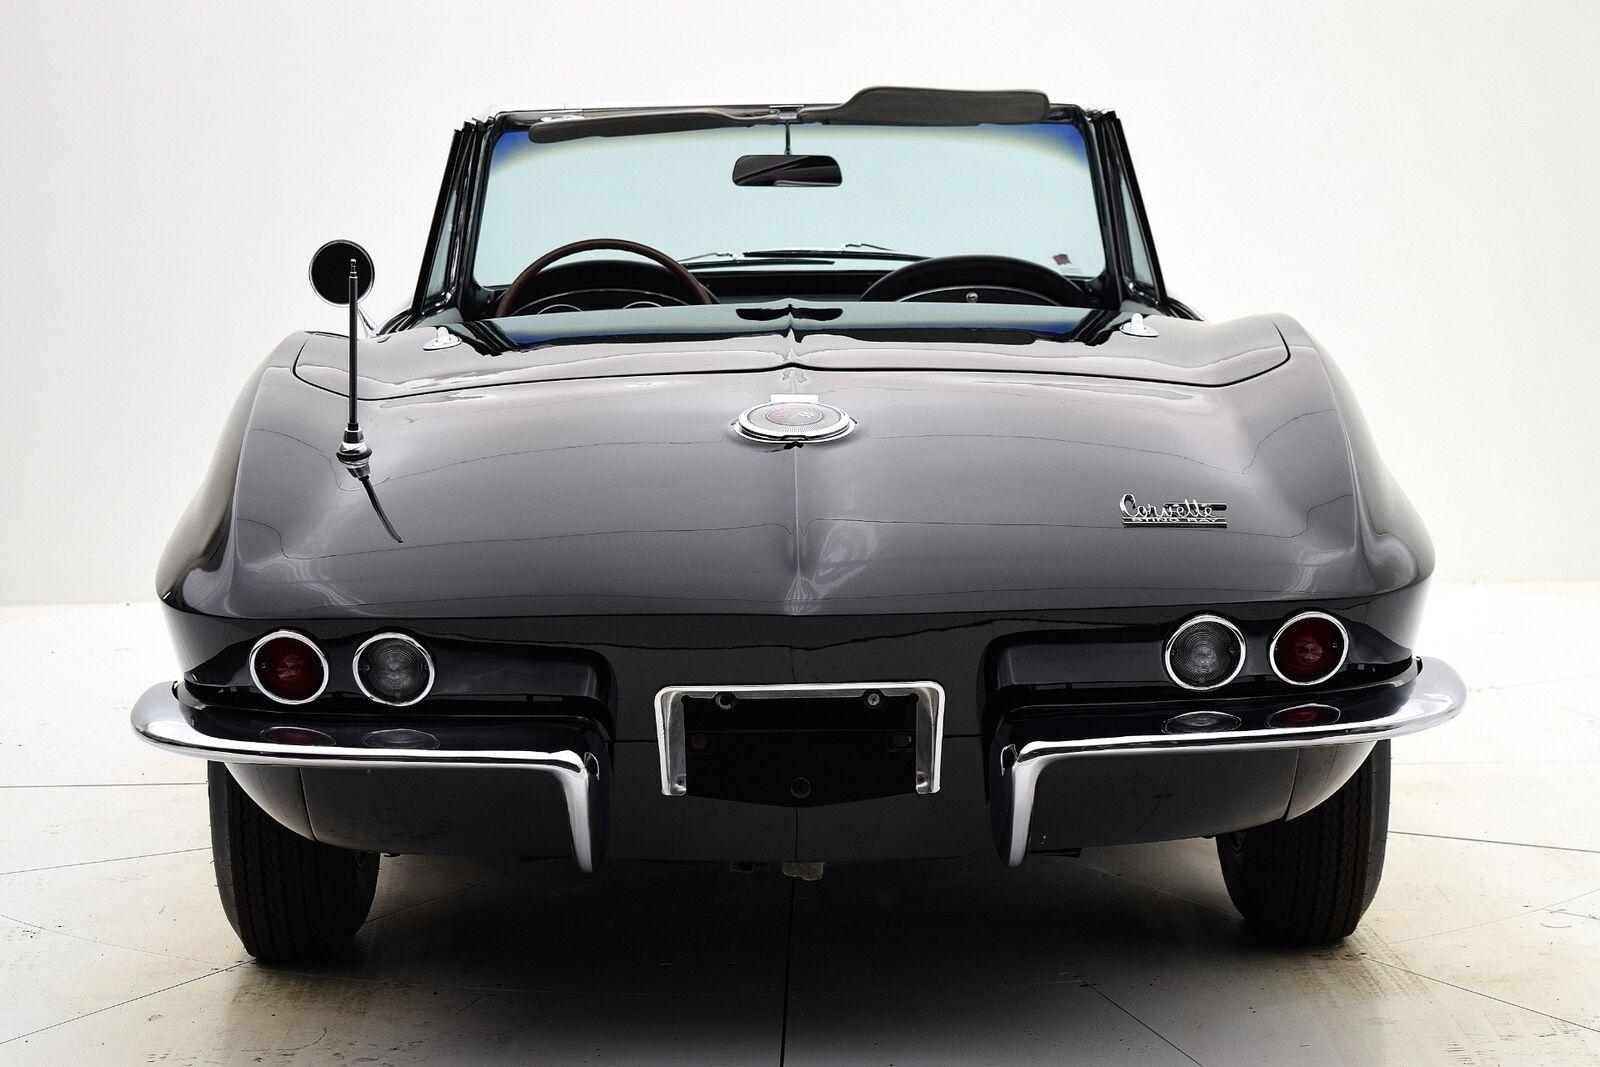 1966 Black Chevrolet Corvette Convertible  | C2 Corvette Photo 5